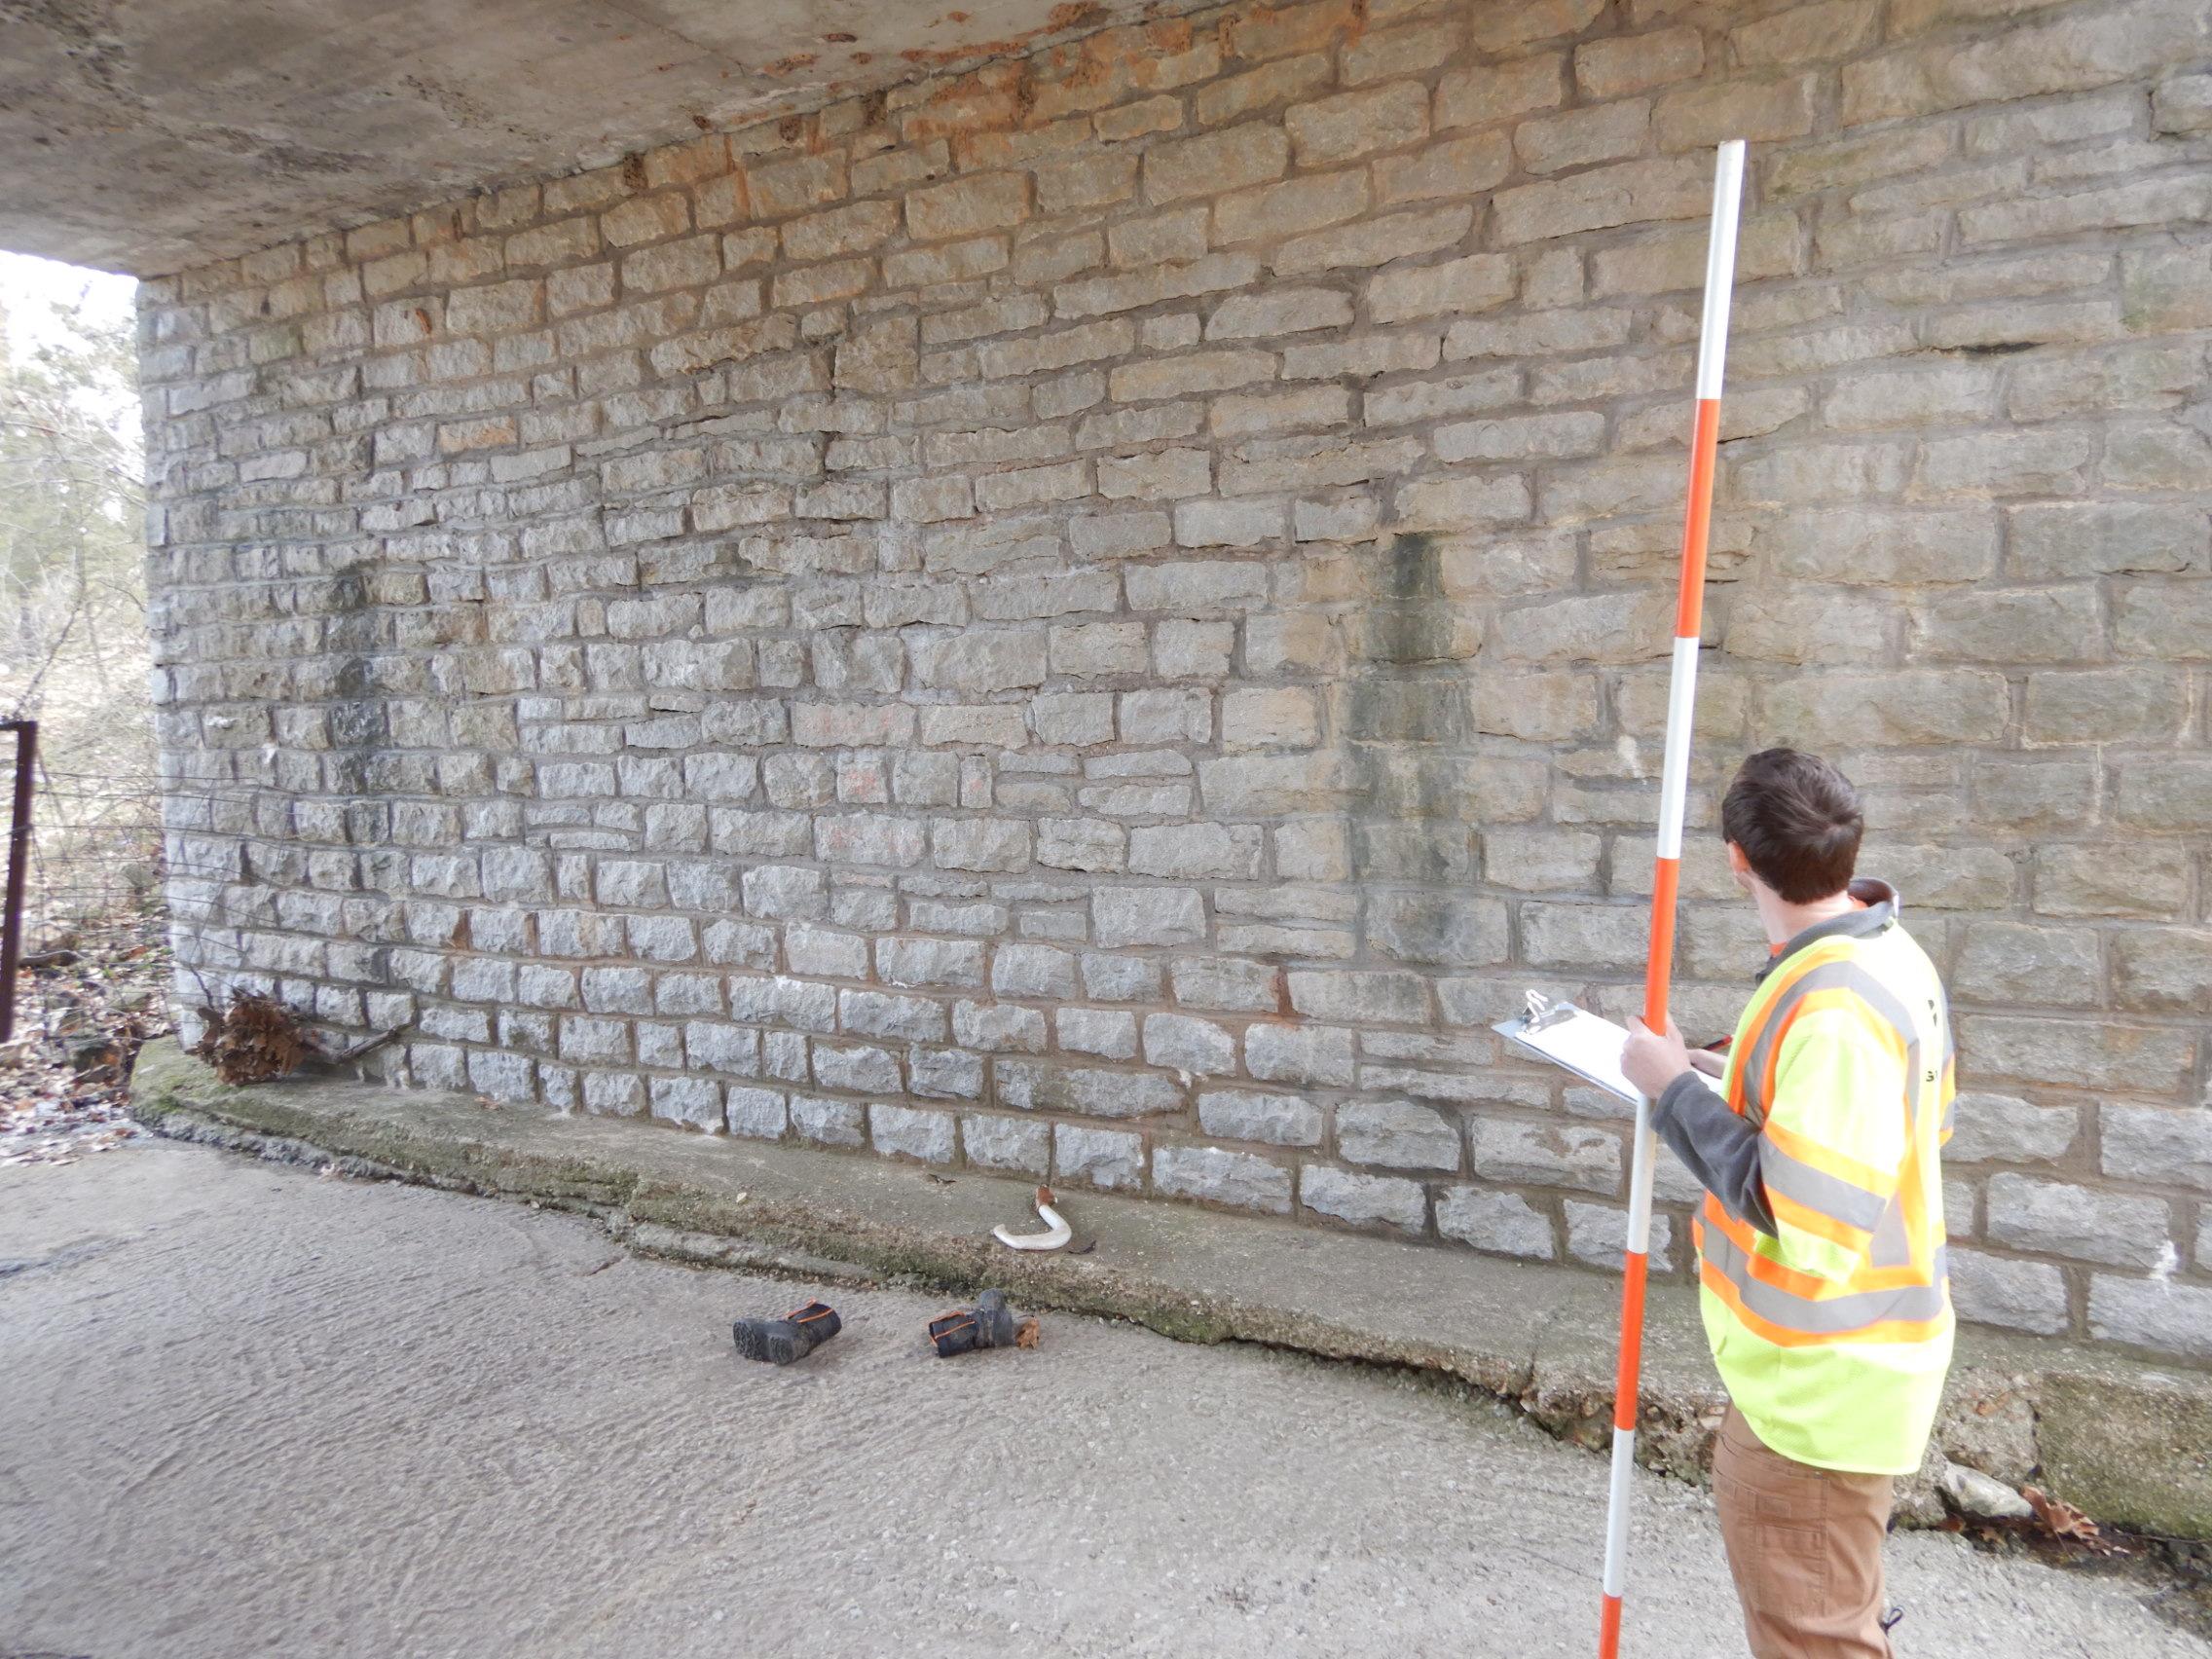 off system bridge inspection